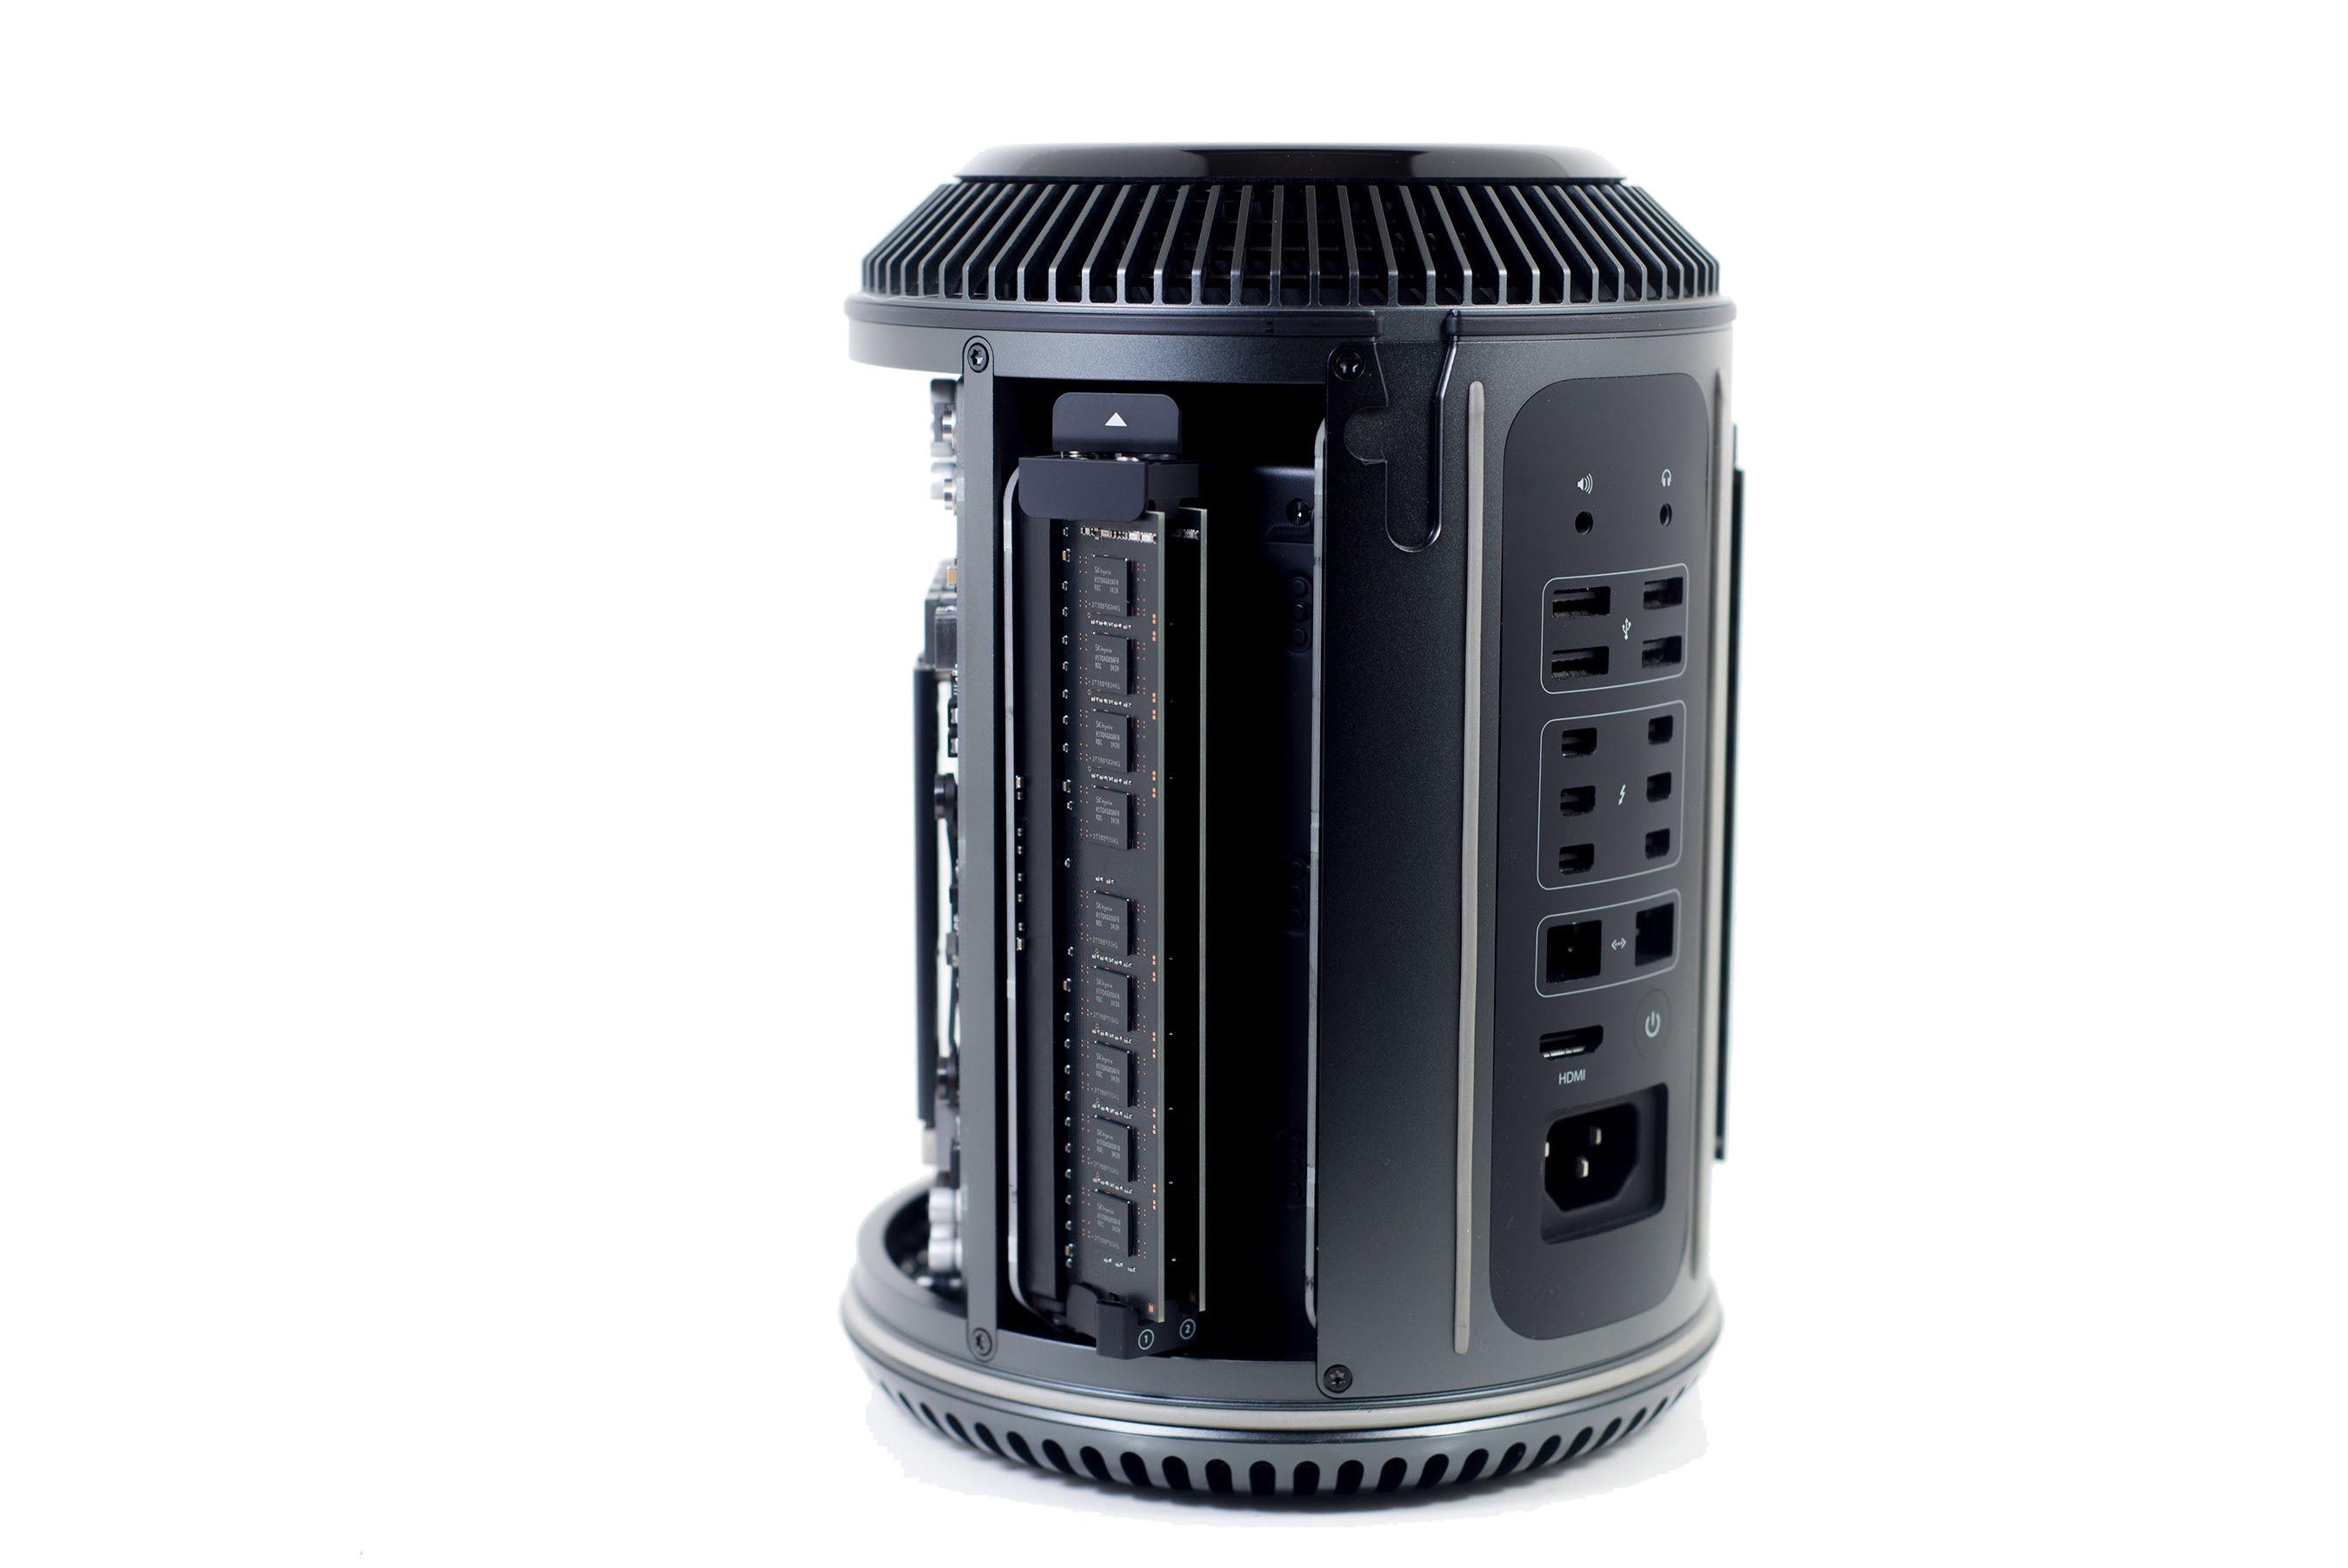 2013: Mac Pro 6,1